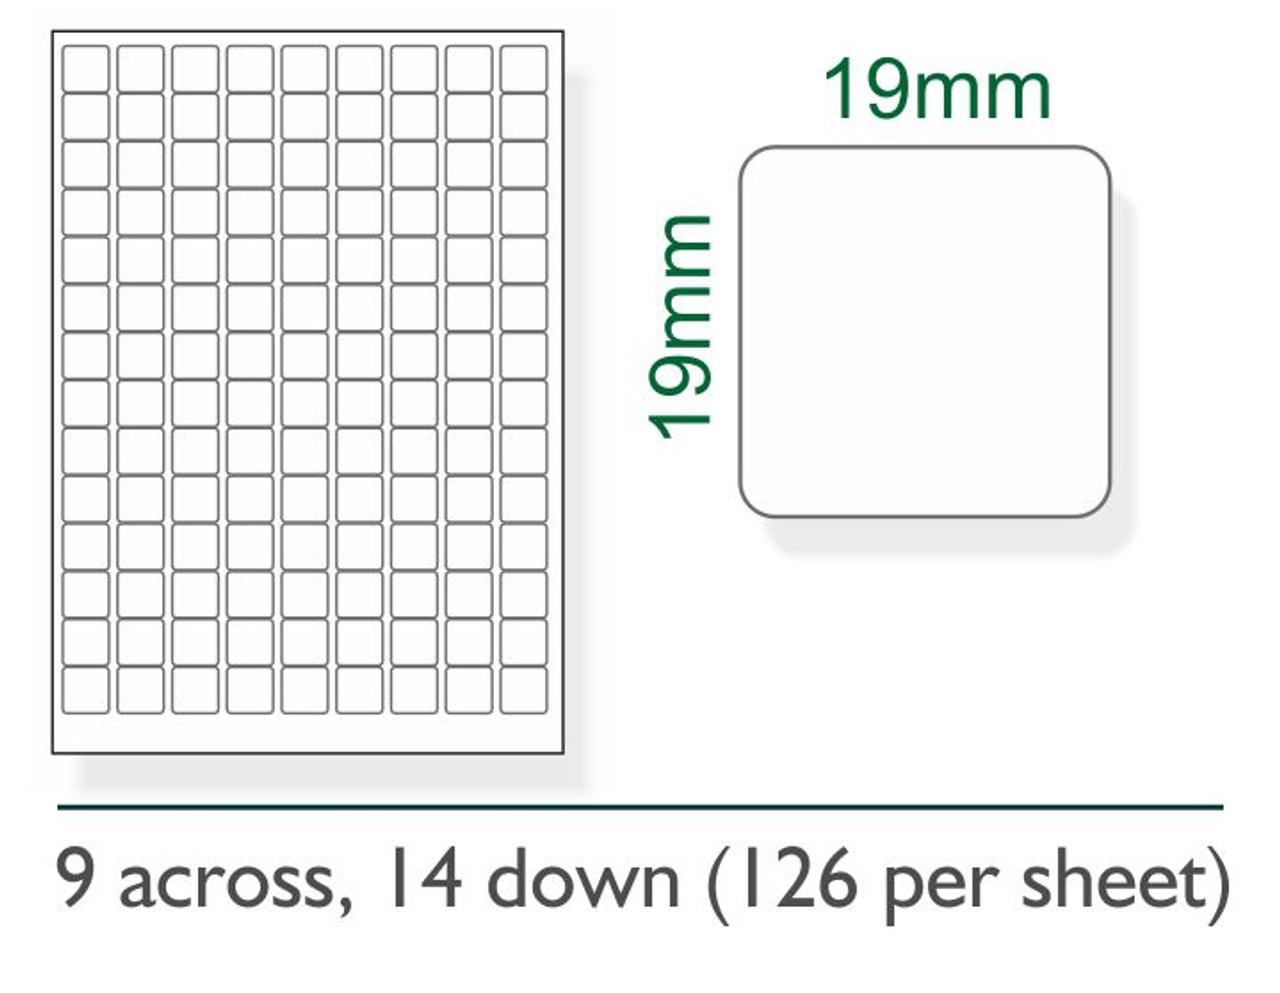 19mm x 19mm labels